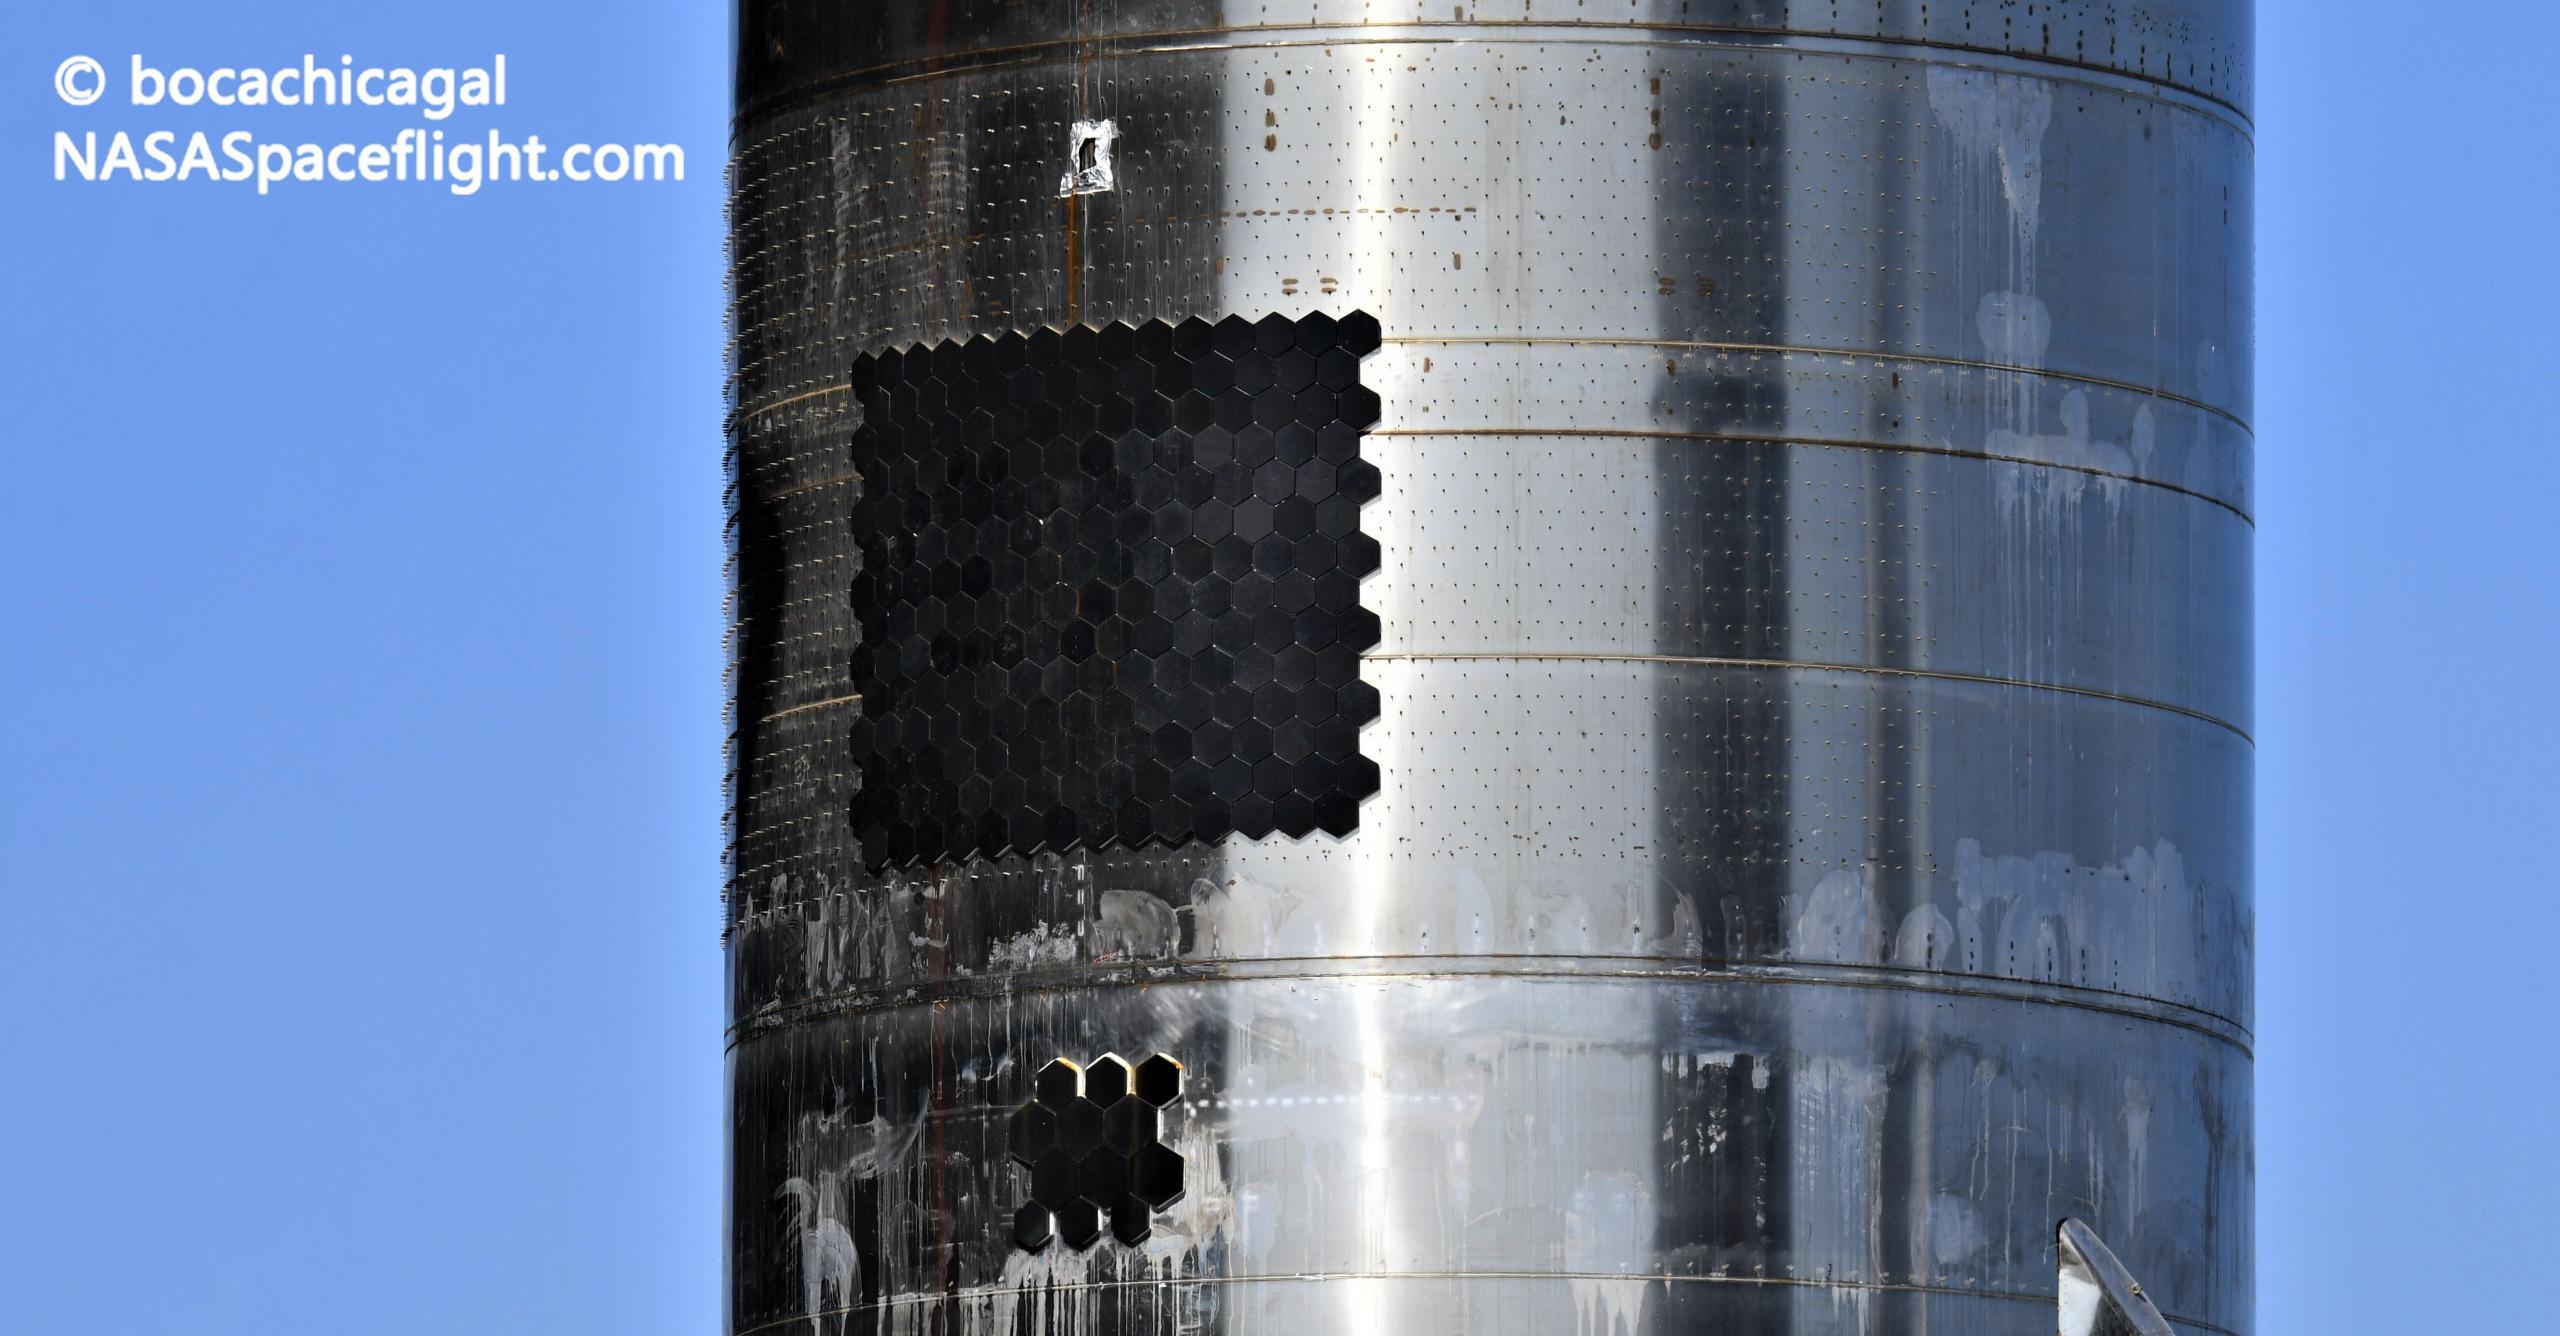 Starship Boca Chica 012921 (NASASpaceflight – bocachicagal) SN10 heat shield 1 crop (c)